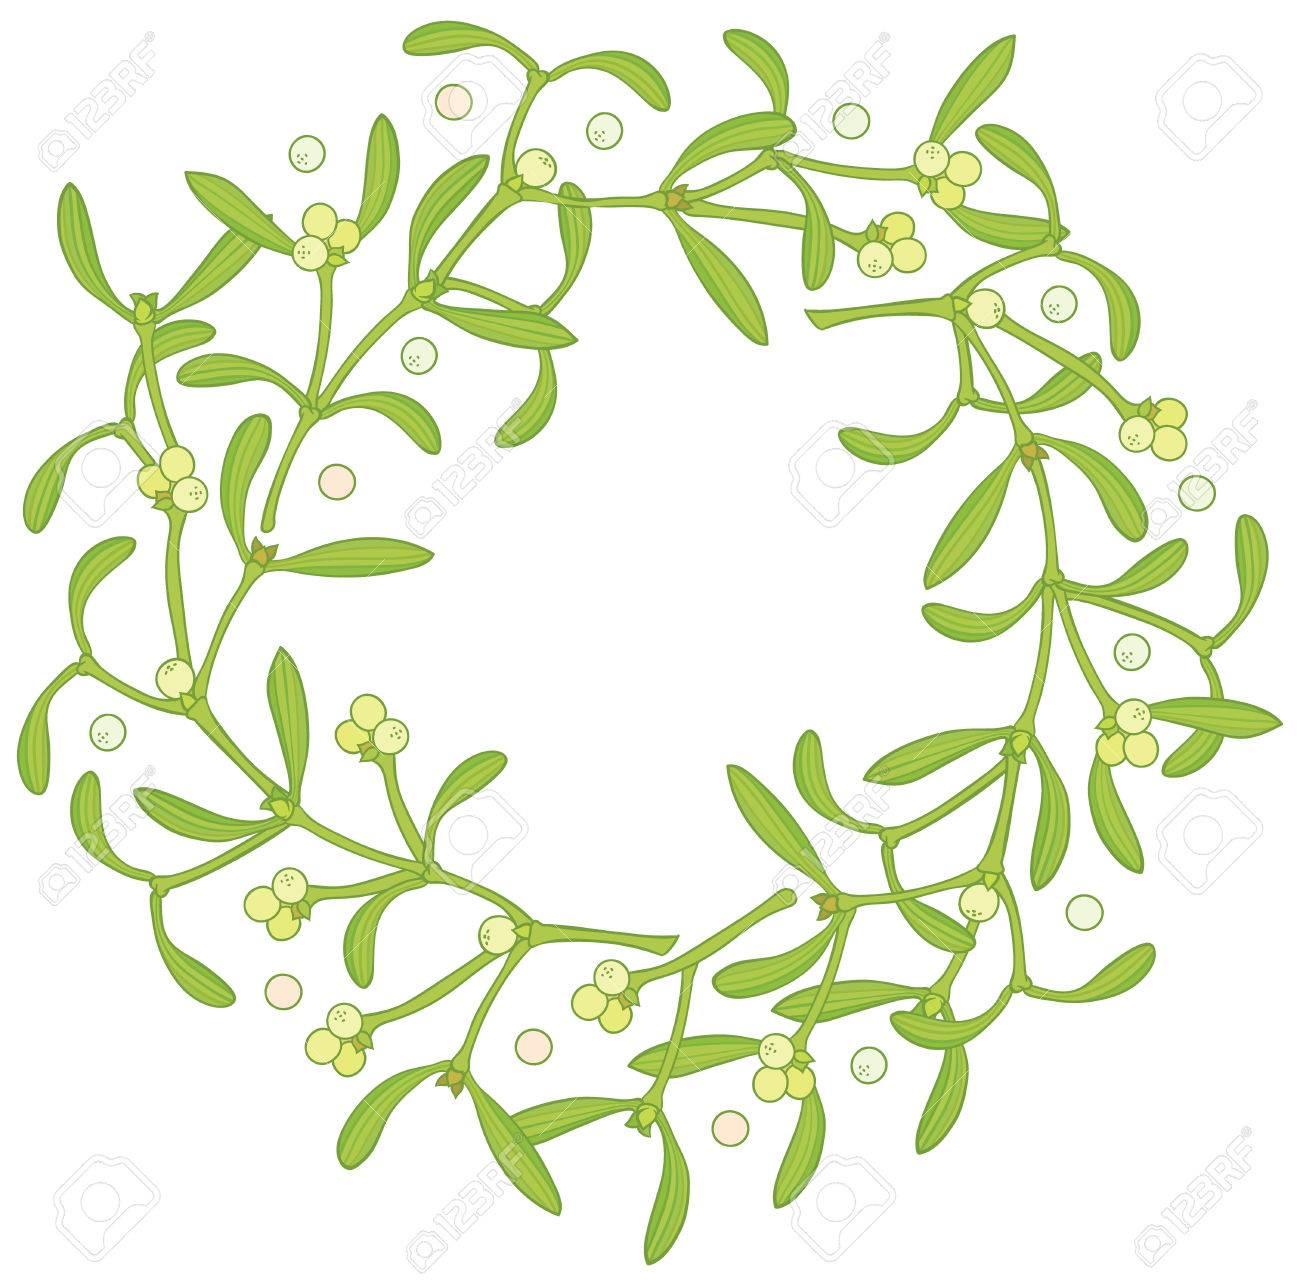 wreath of mistletoe vector christmas vector hand drawing frame rh 123rf com mistletoe vector black and white mistletoe vector image